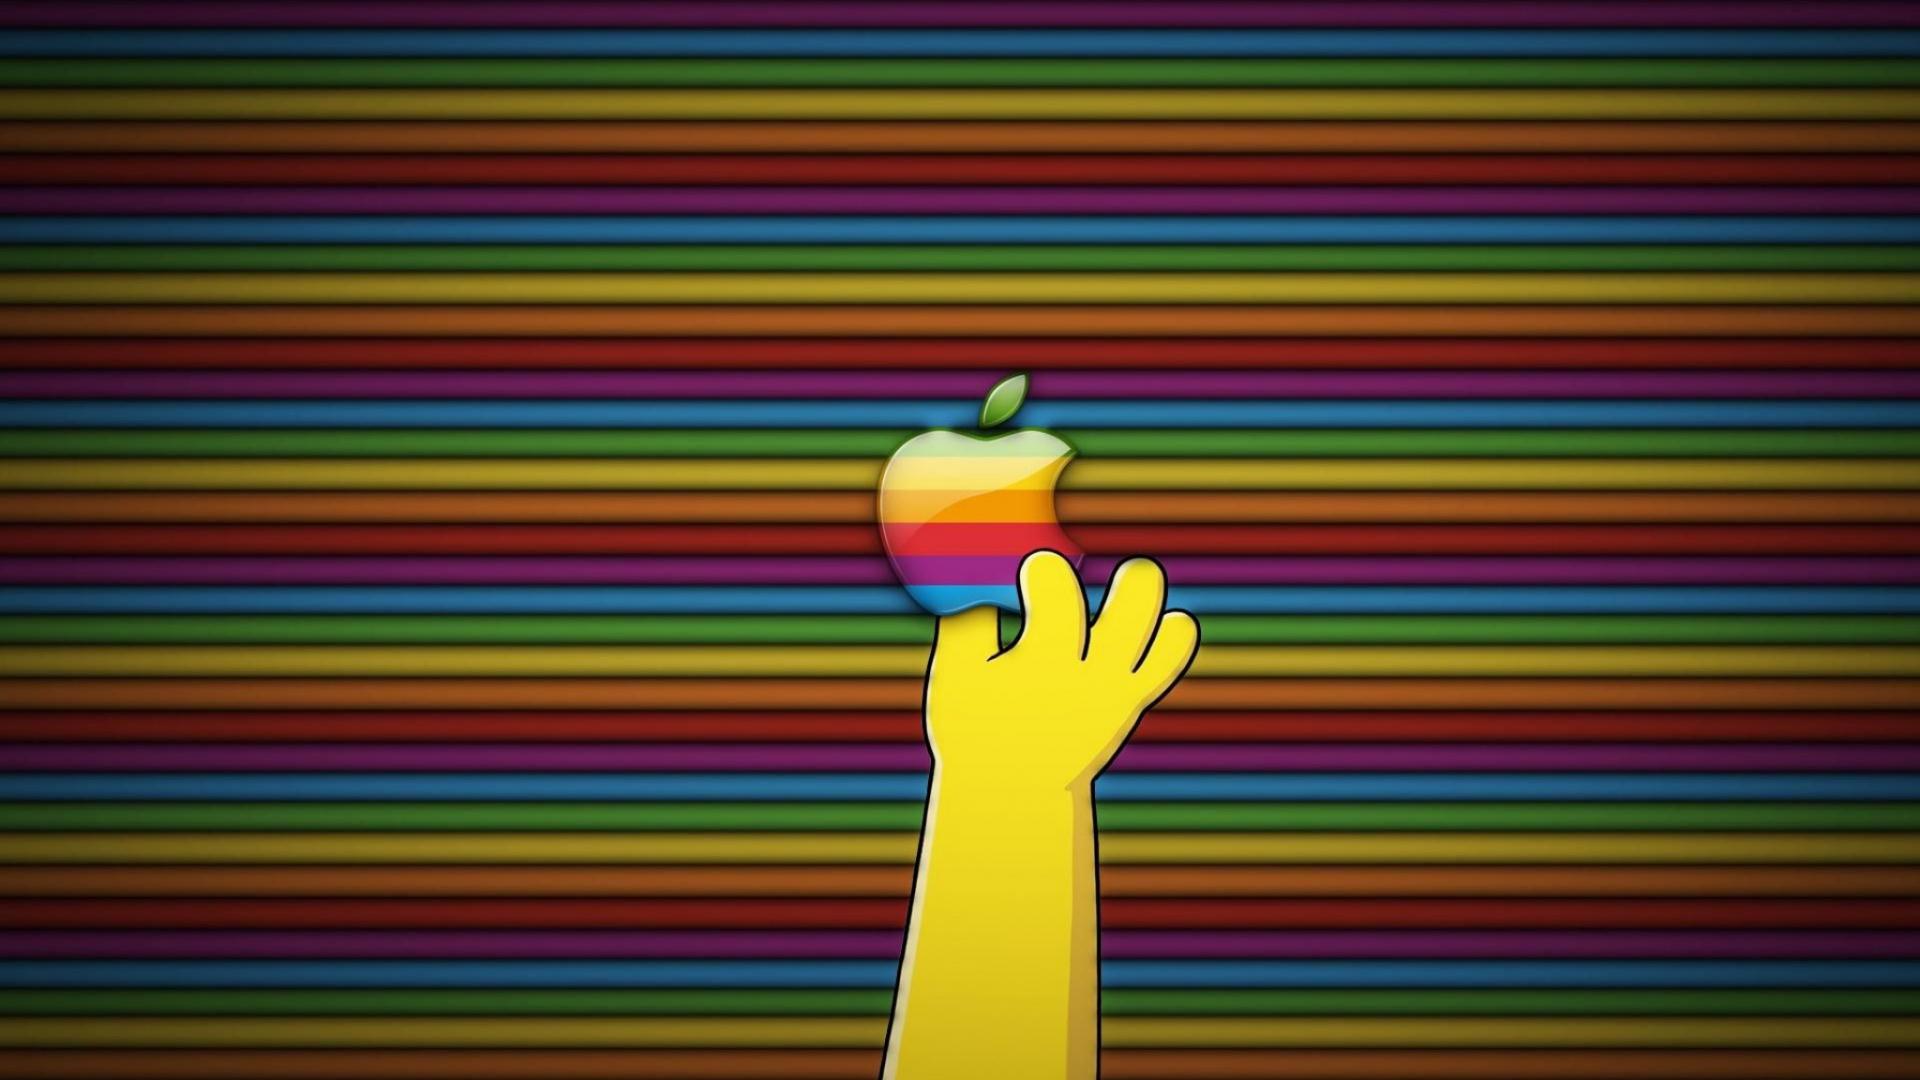 Free Download Wallpaper Apple 2048x1152 Px Wallpaper